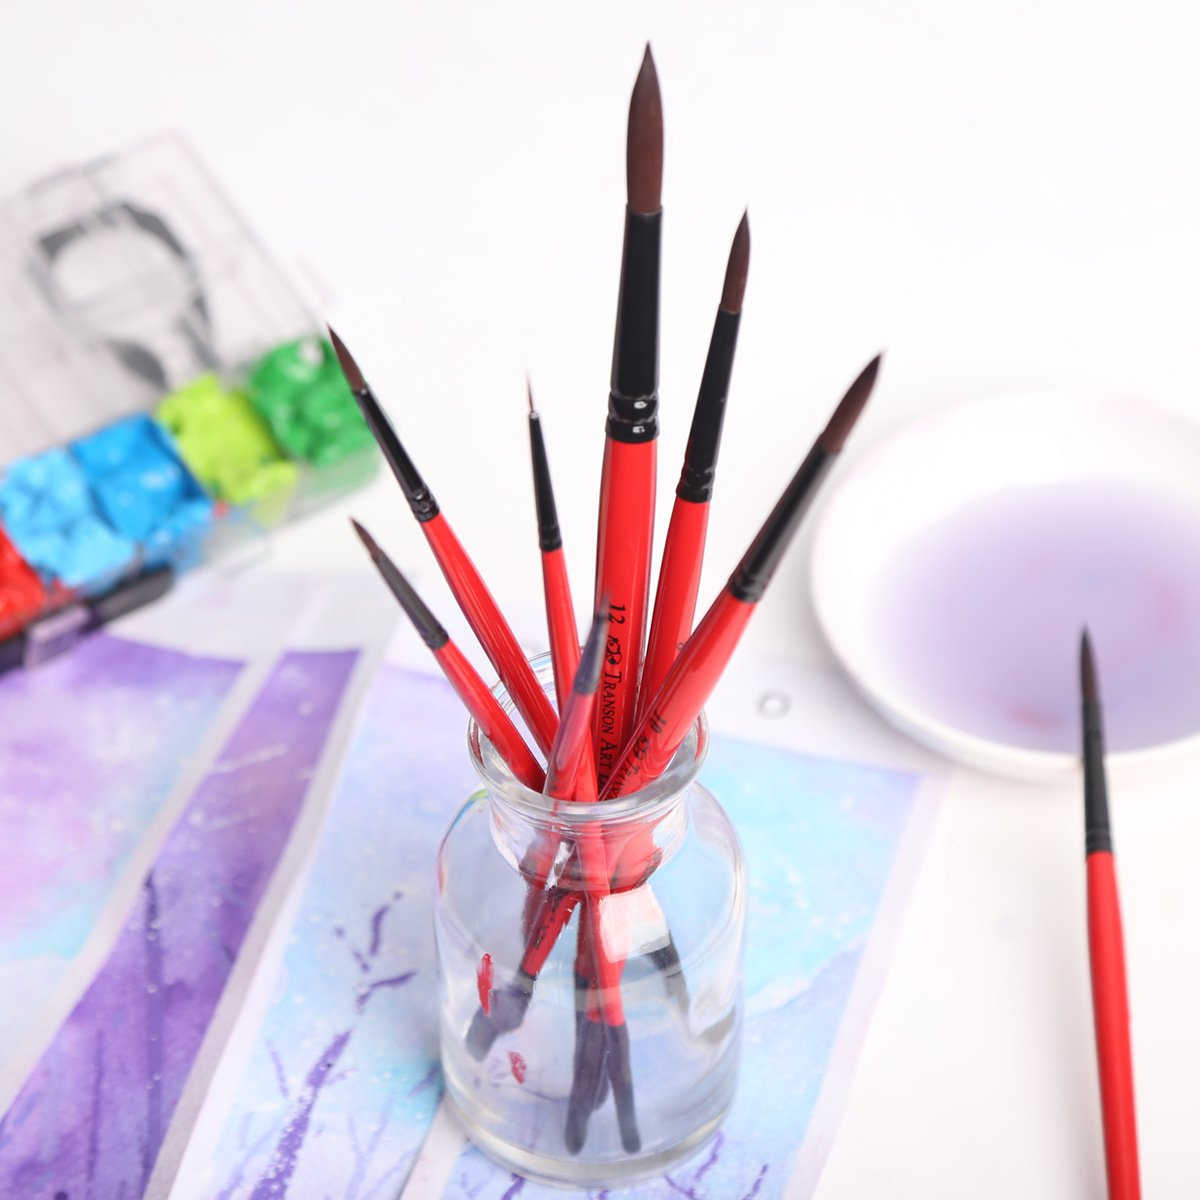 Oil Tempera Transon Round Artist Paint Brush Detail Set 9pcs for Acrylic Enamel and Face Painting Gouache